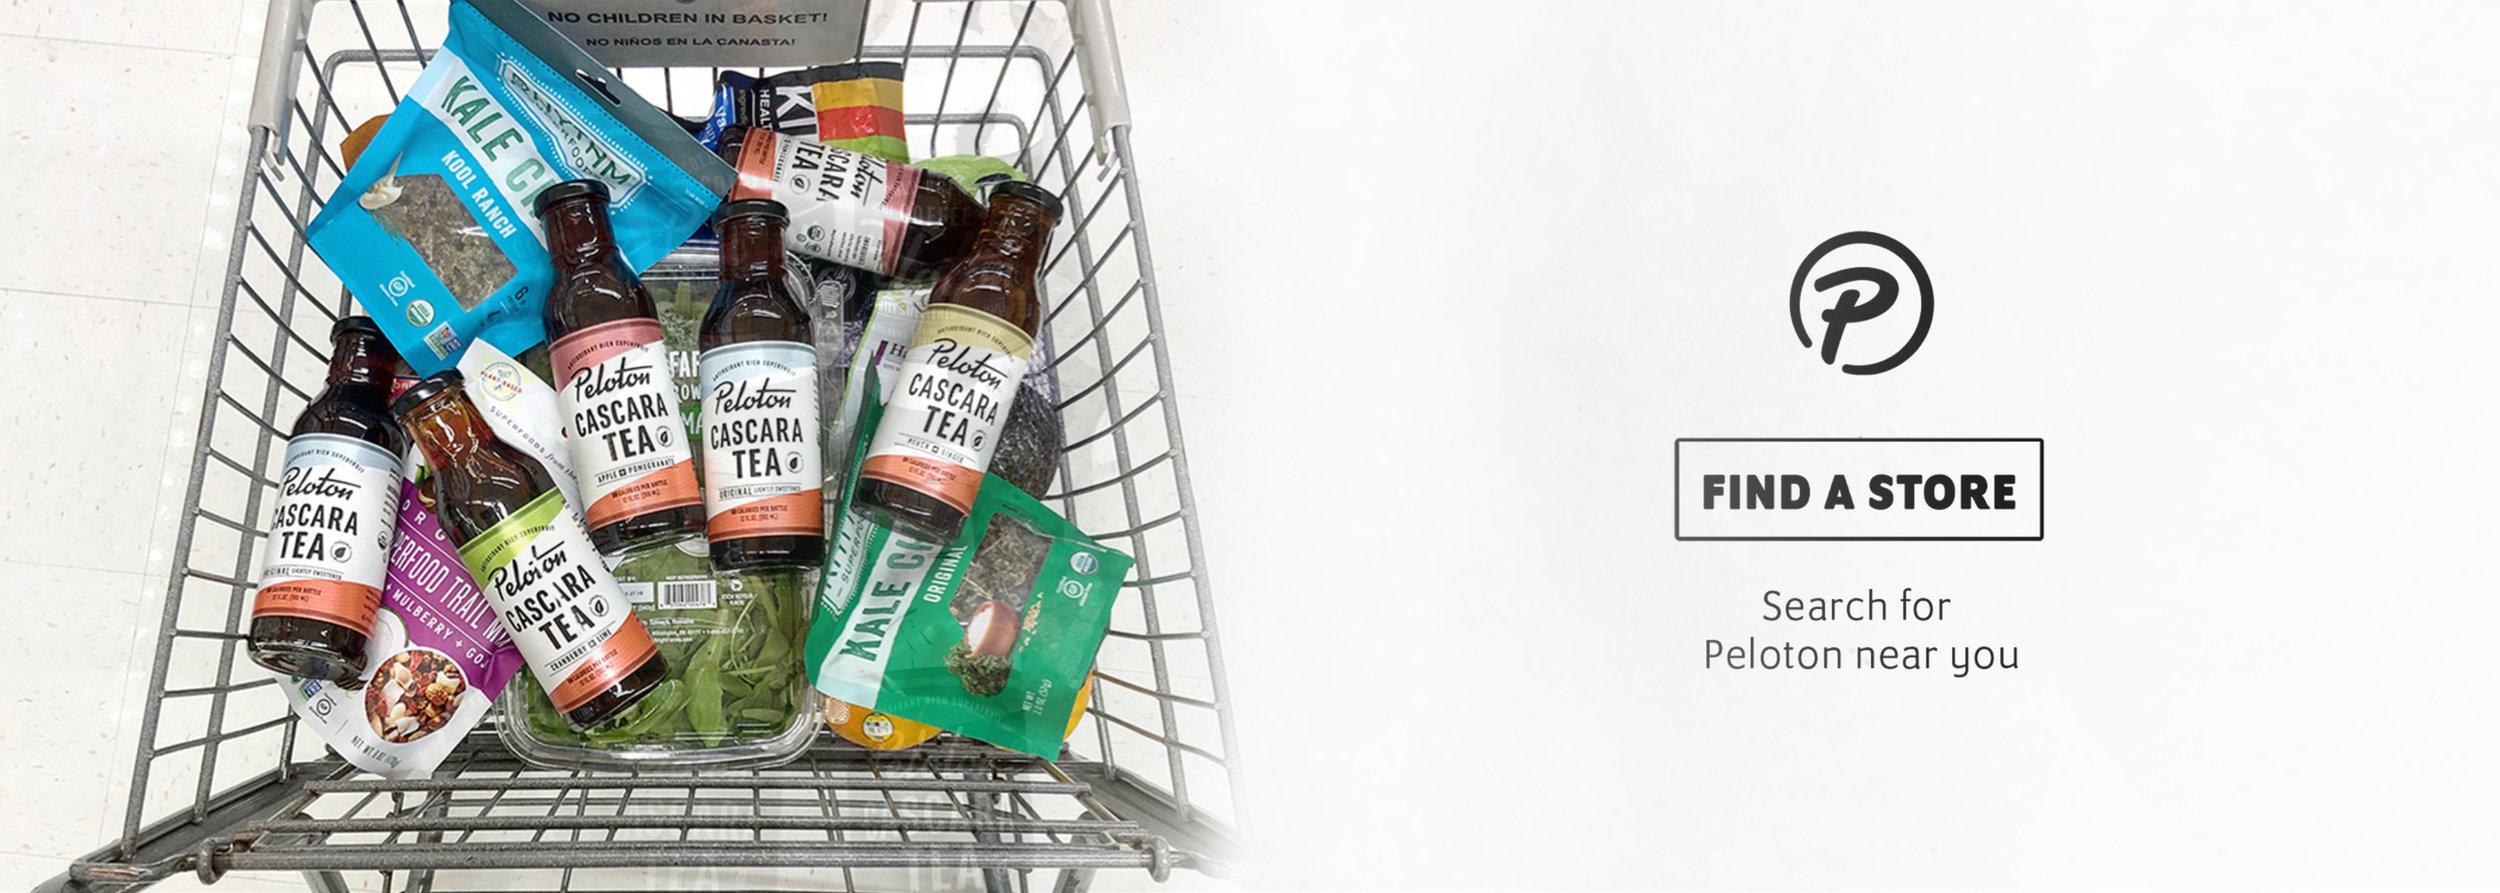 shoppingcart2.jpg